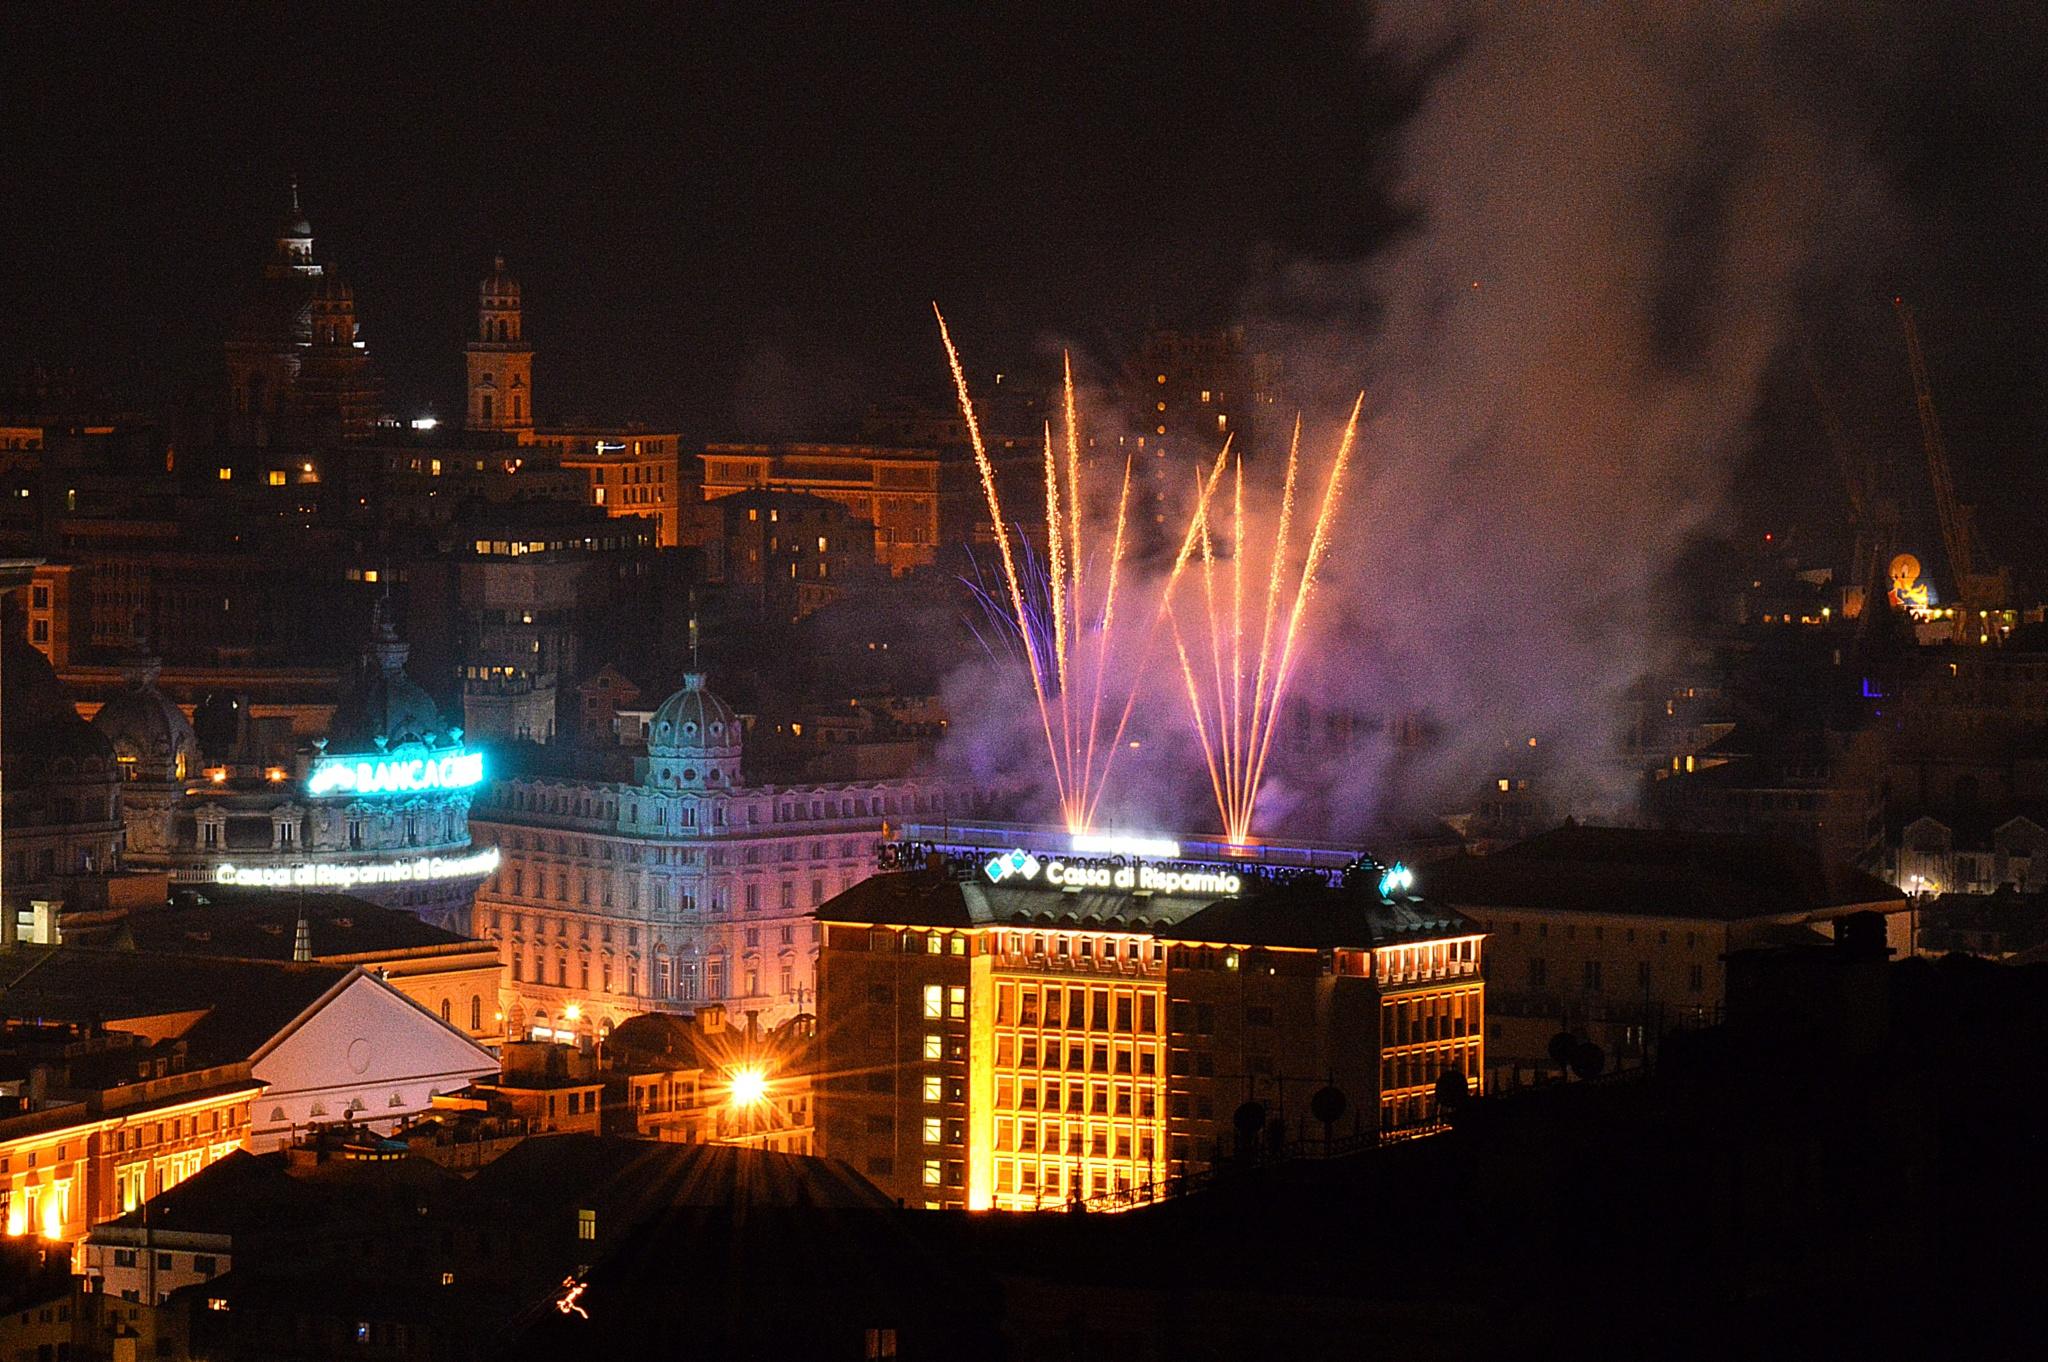 Fireworks_ by Mistral Moratti